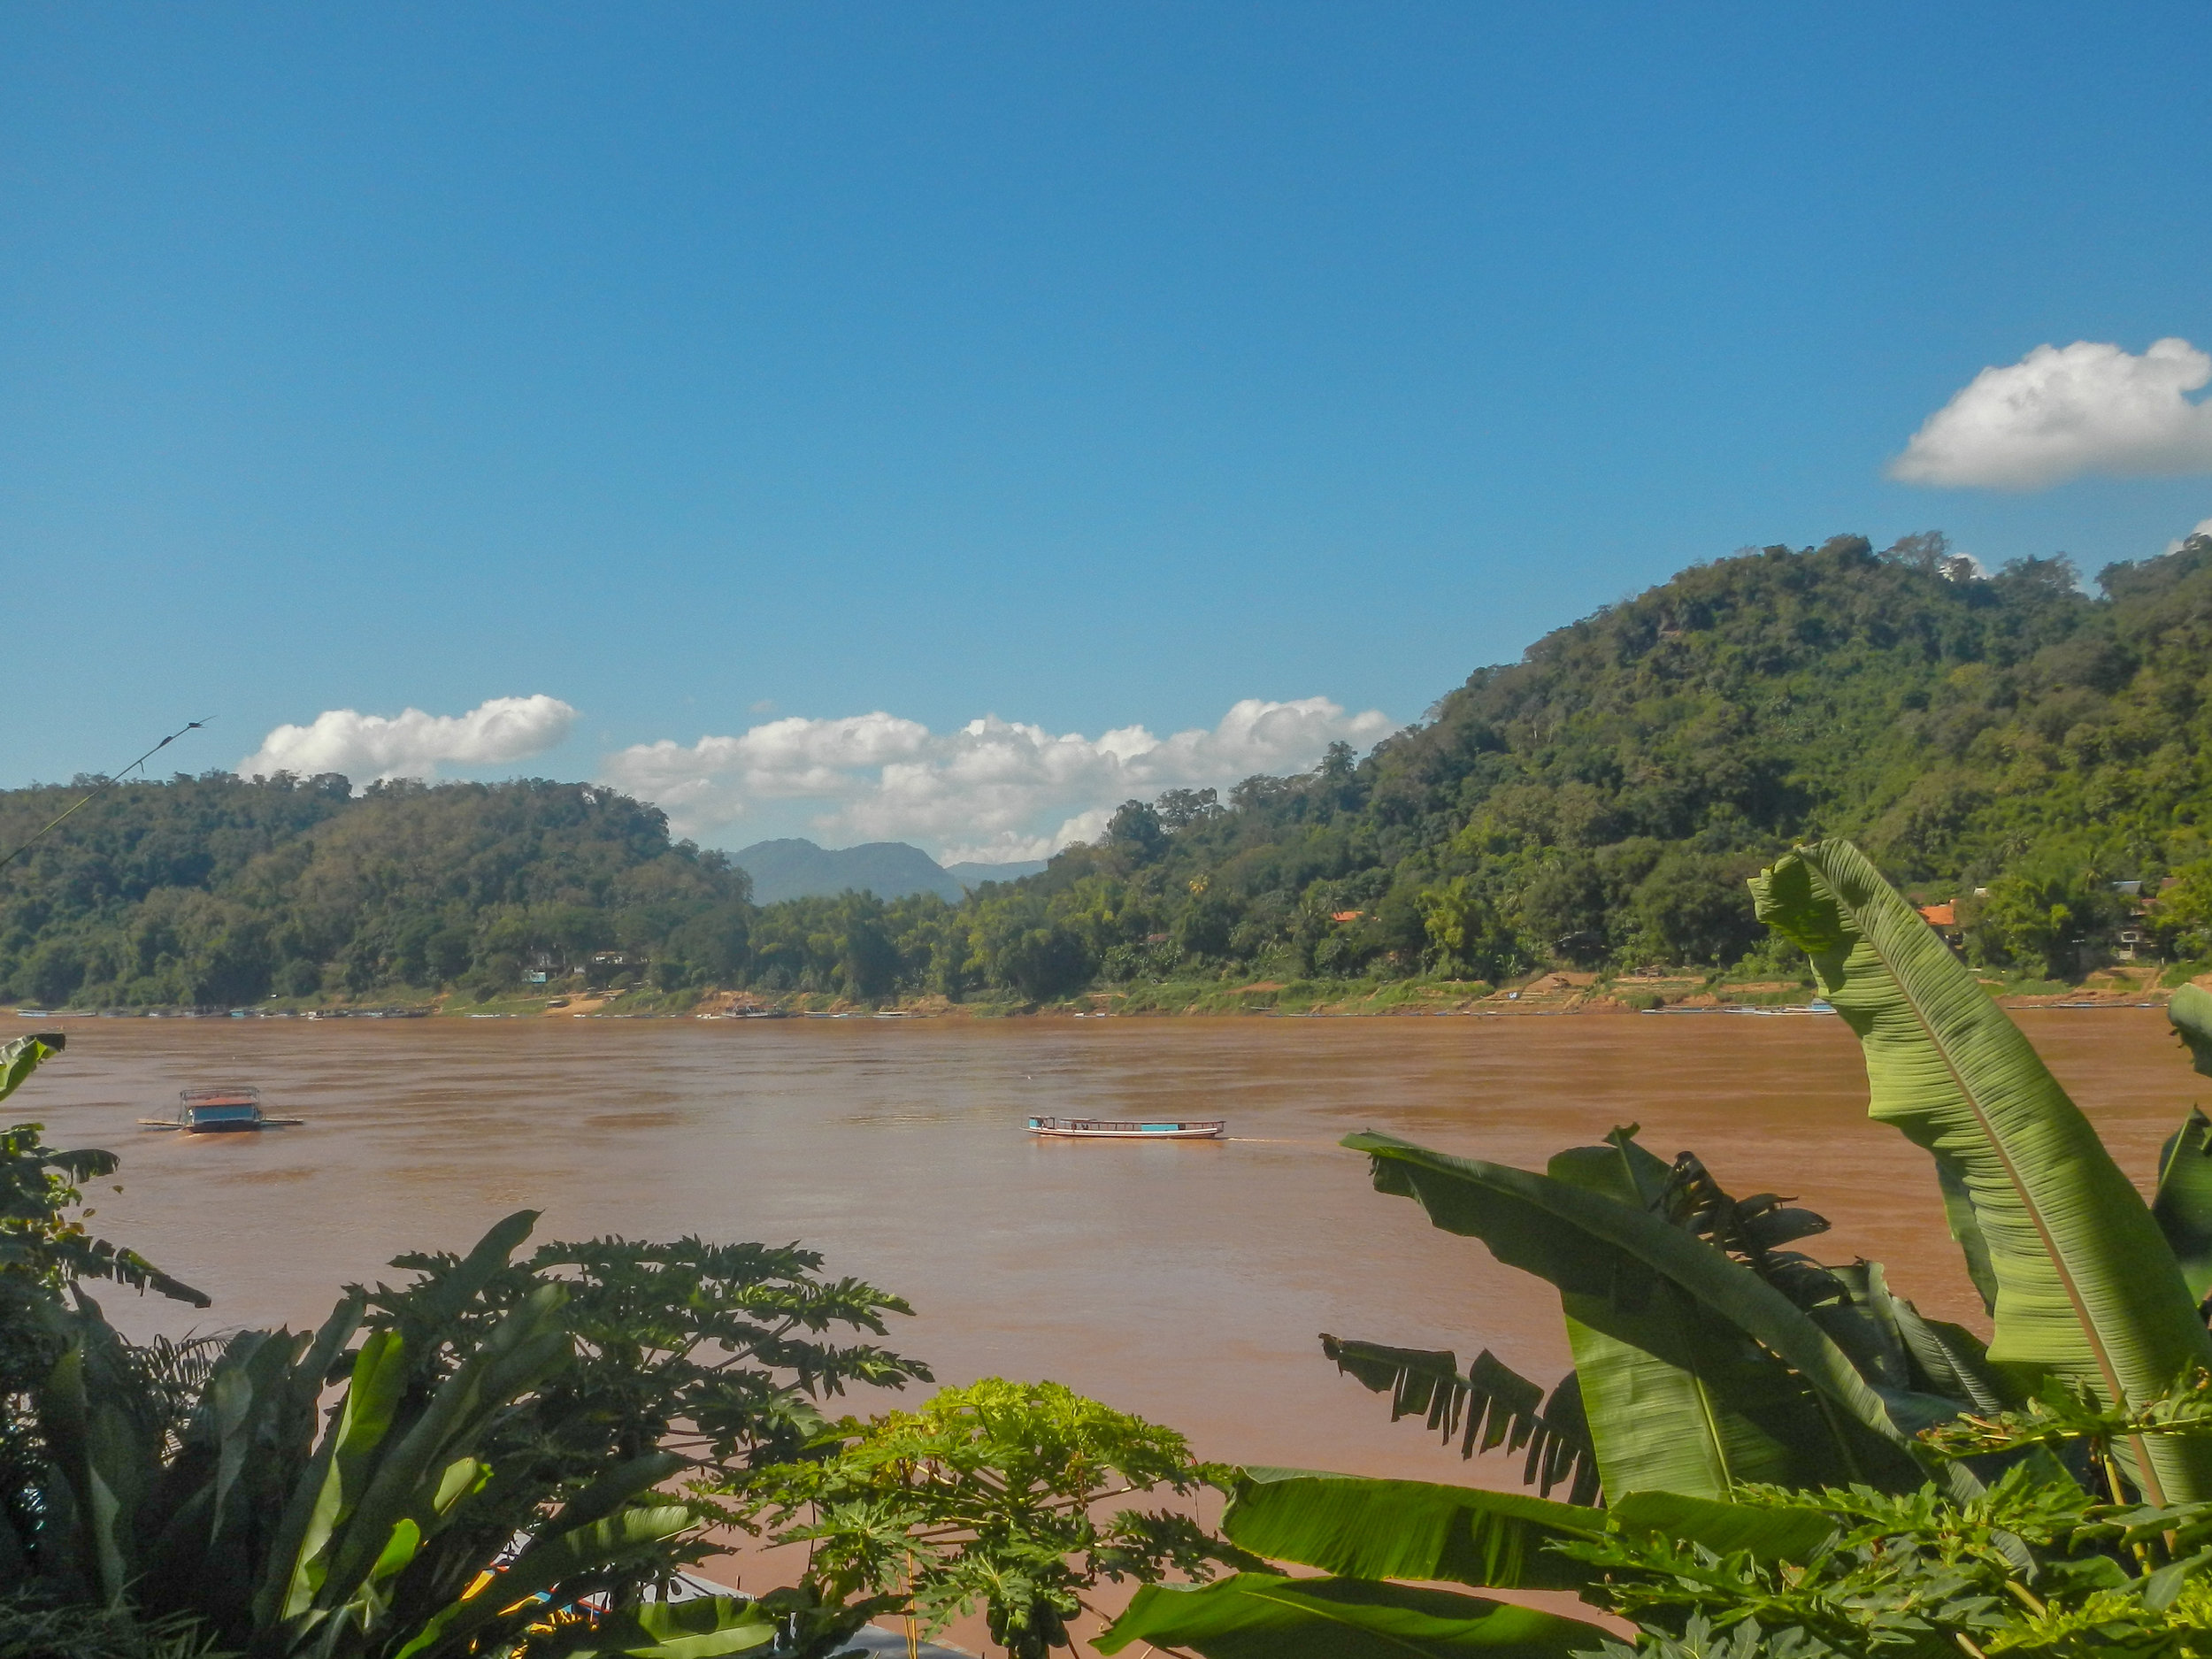 Mekong River, KhemKhong, Luang Prabang, Laos